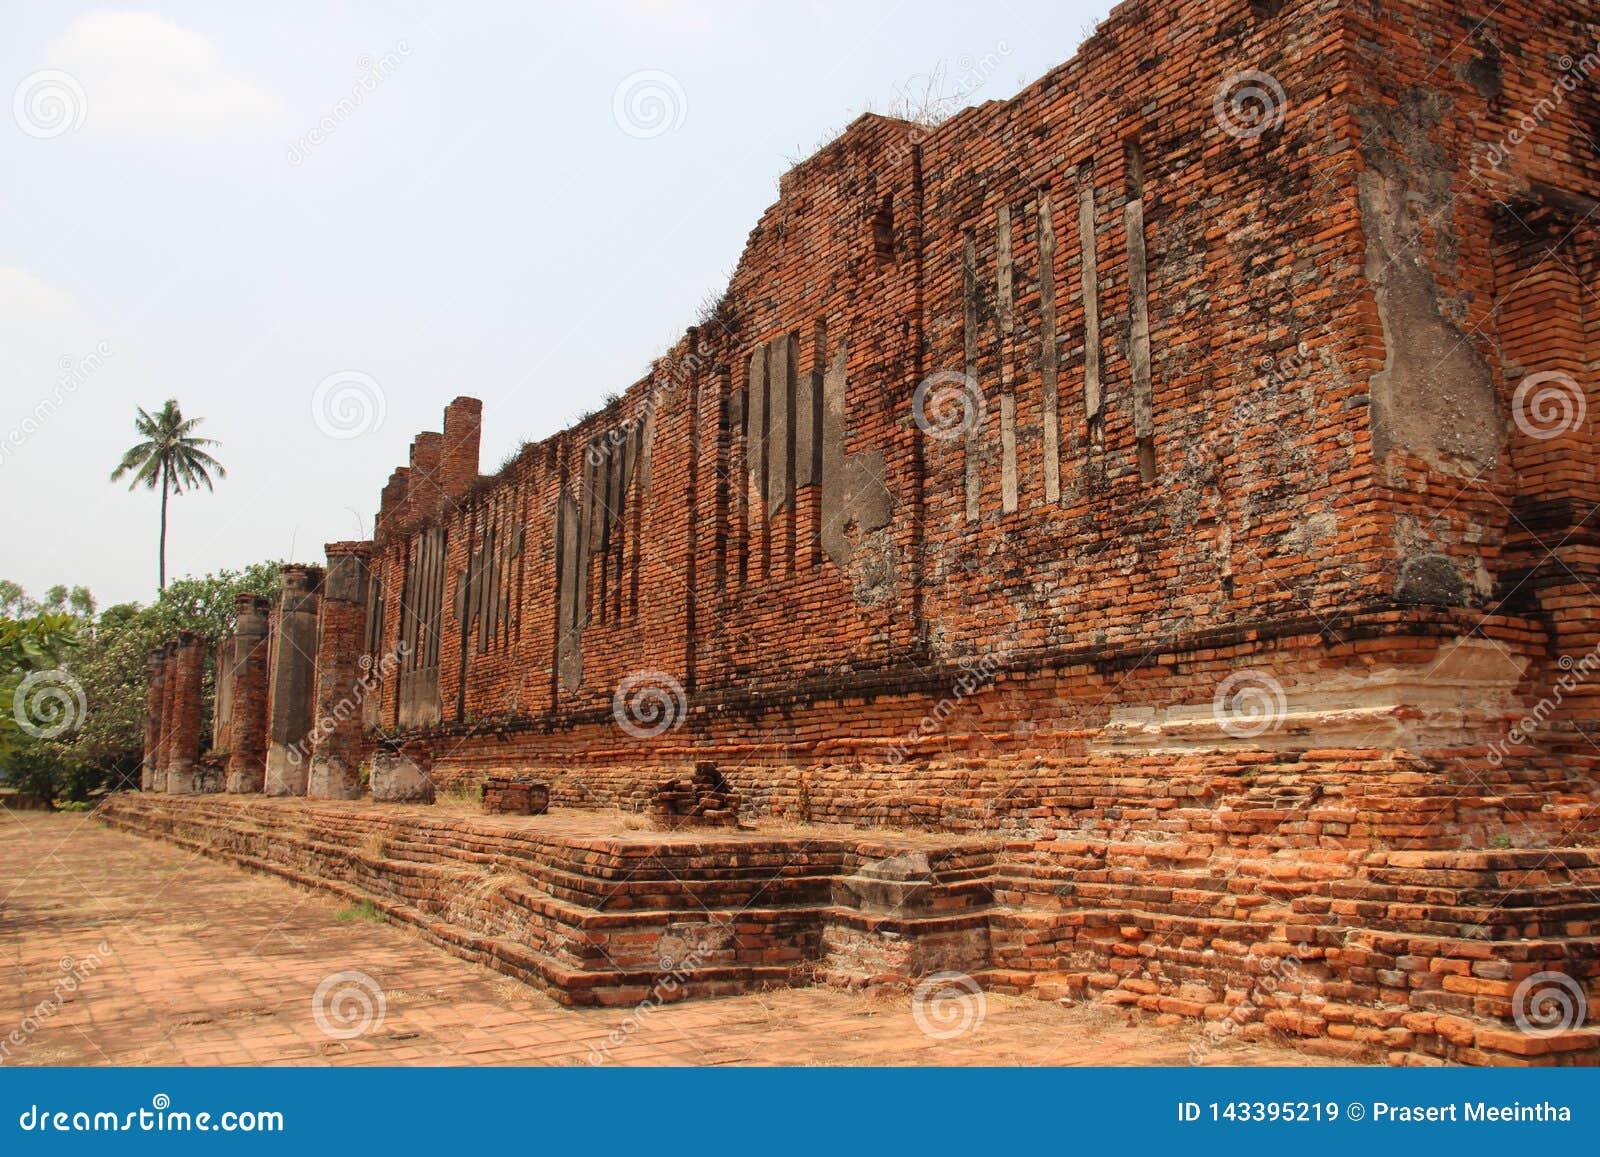 Old Bricks Walls With Pillars Sunlight